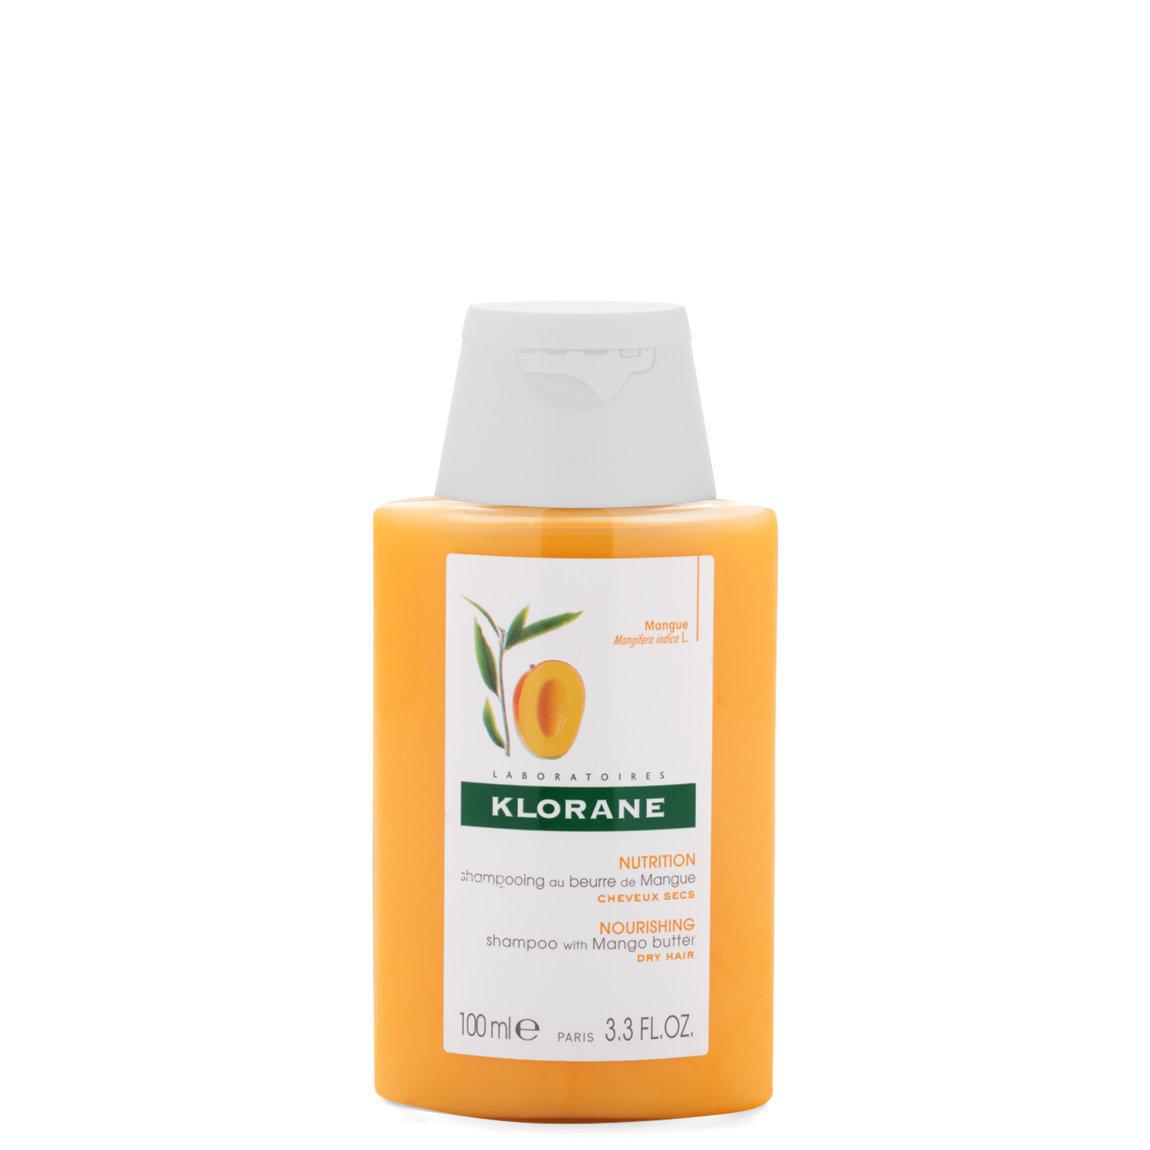 Klorane Shampoo with Mango Butter 3.3 oz product swatch.